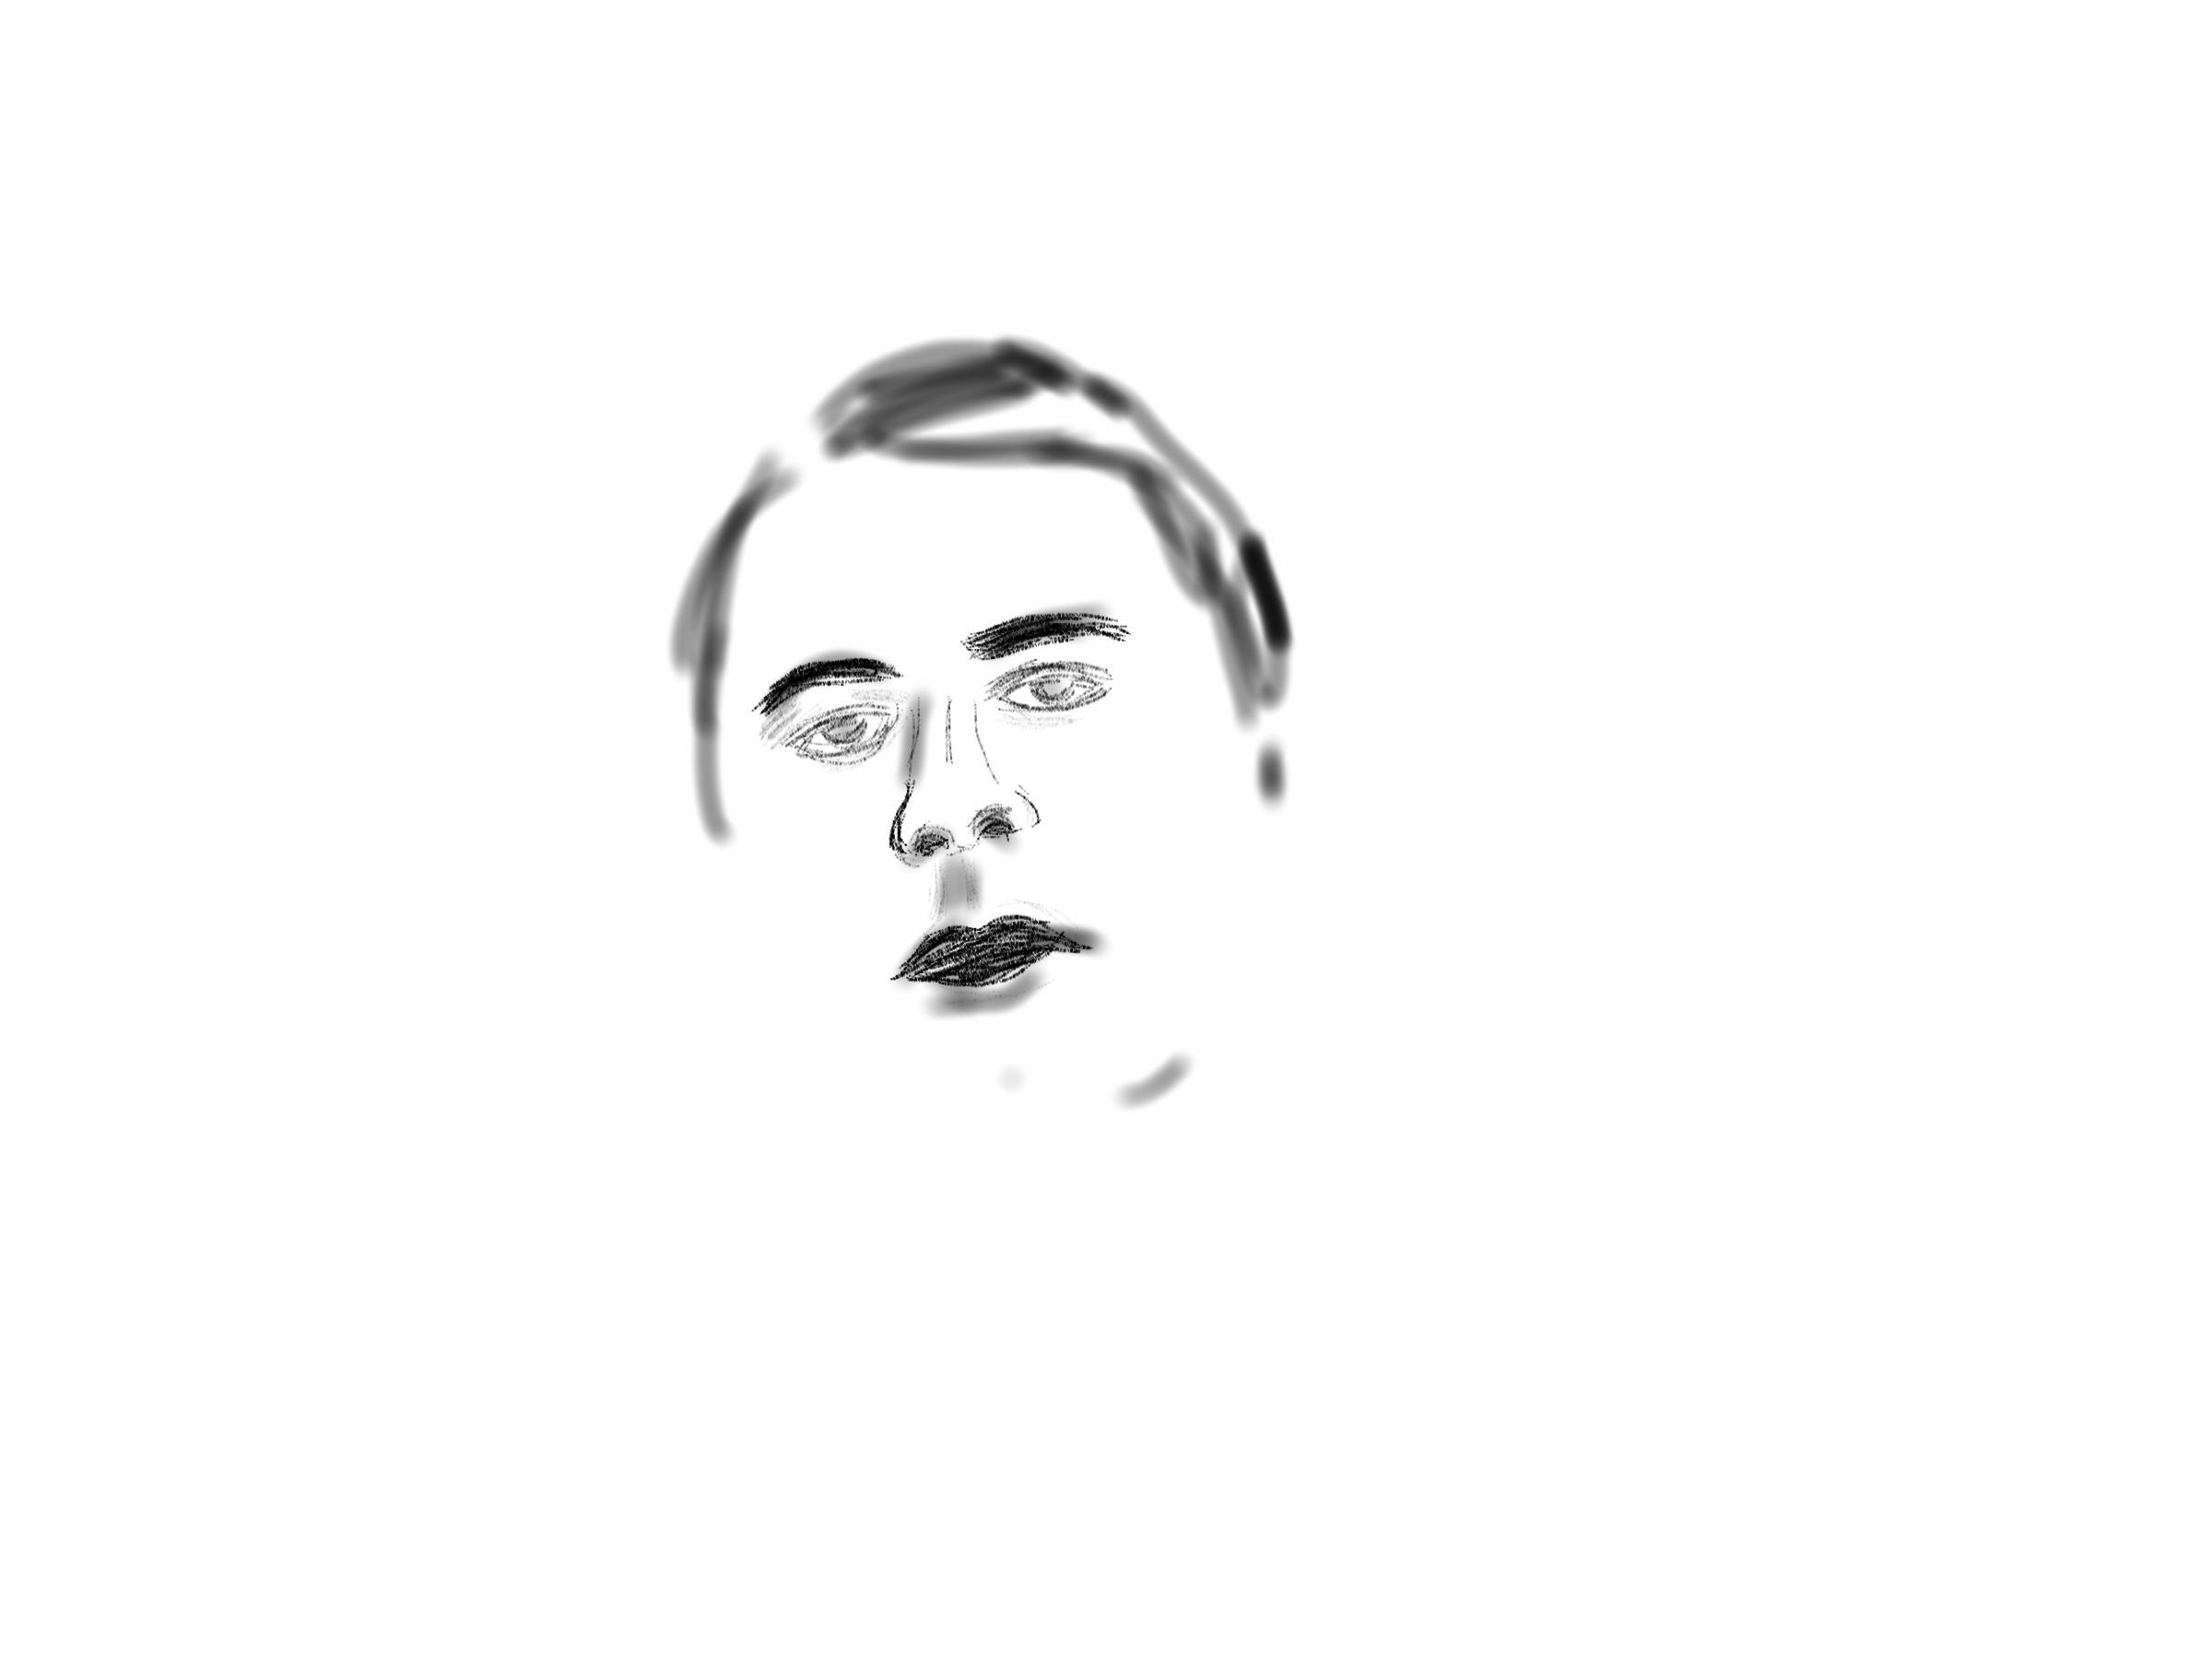 Drawn in Sketchbook Pro- iPad